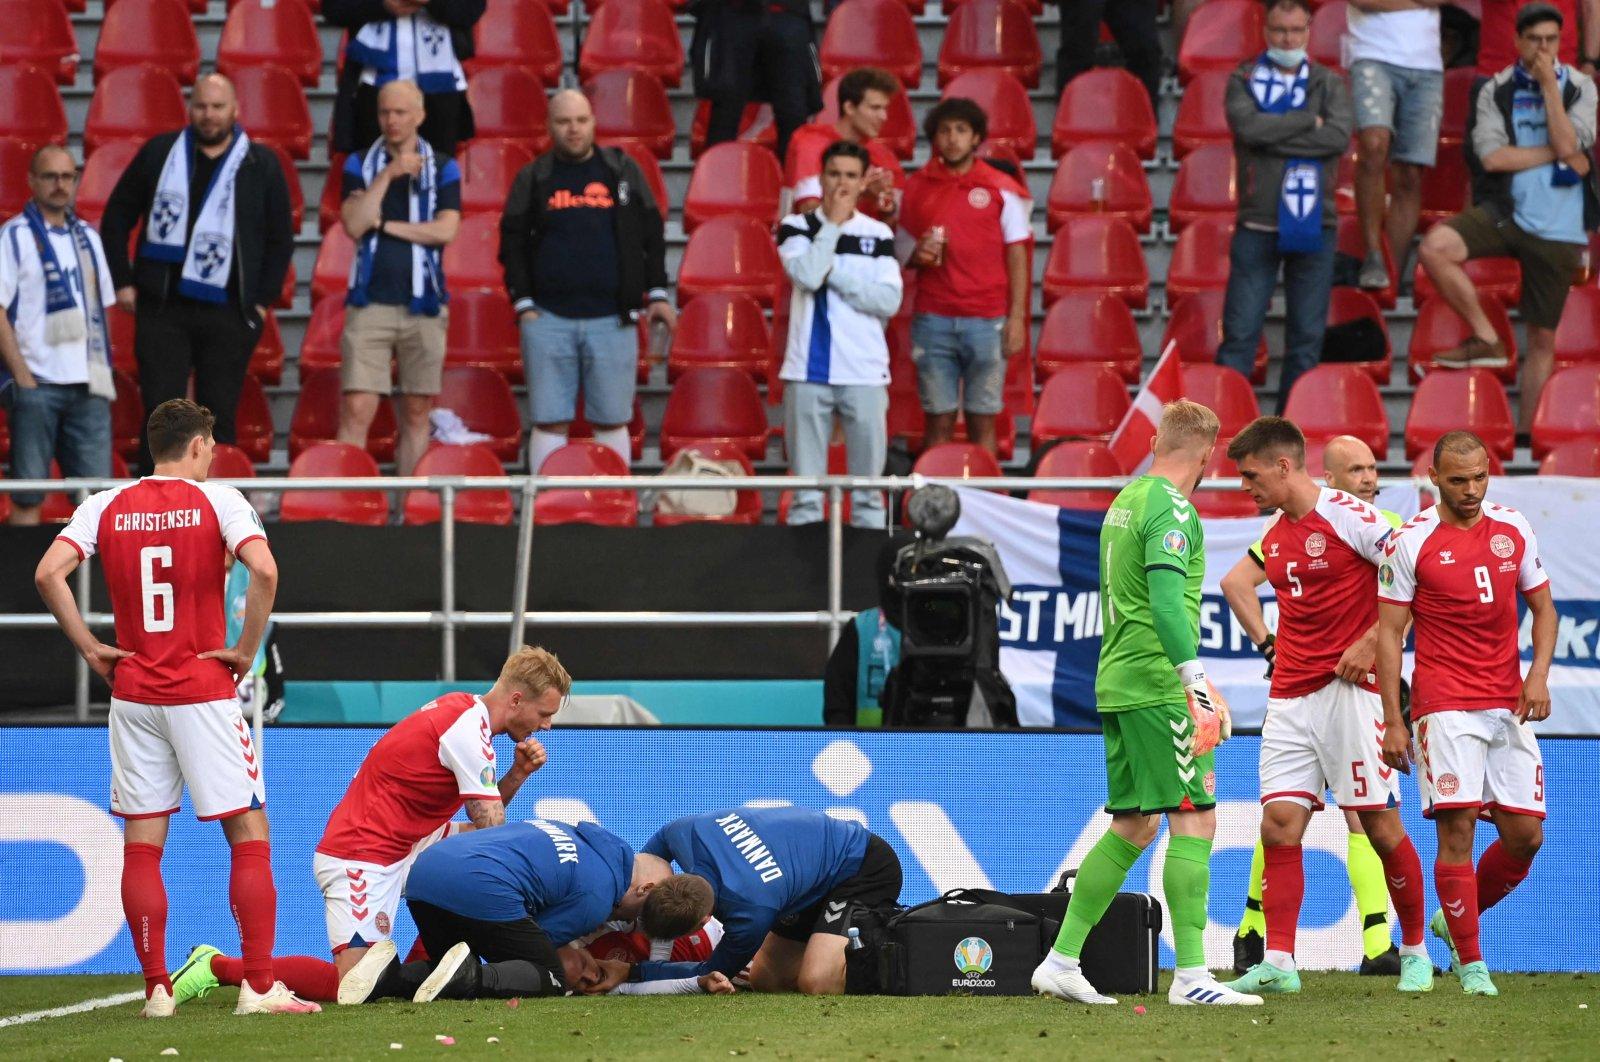 Medics attend to Denmark's midfielder Christian Eriksen after he collapsed during the UEFA EURO 2020 Group B football match between Denmark and Finland at Parken Stadium in Copenhagen, Denmark, June 12, 2021. (AFP Photo)